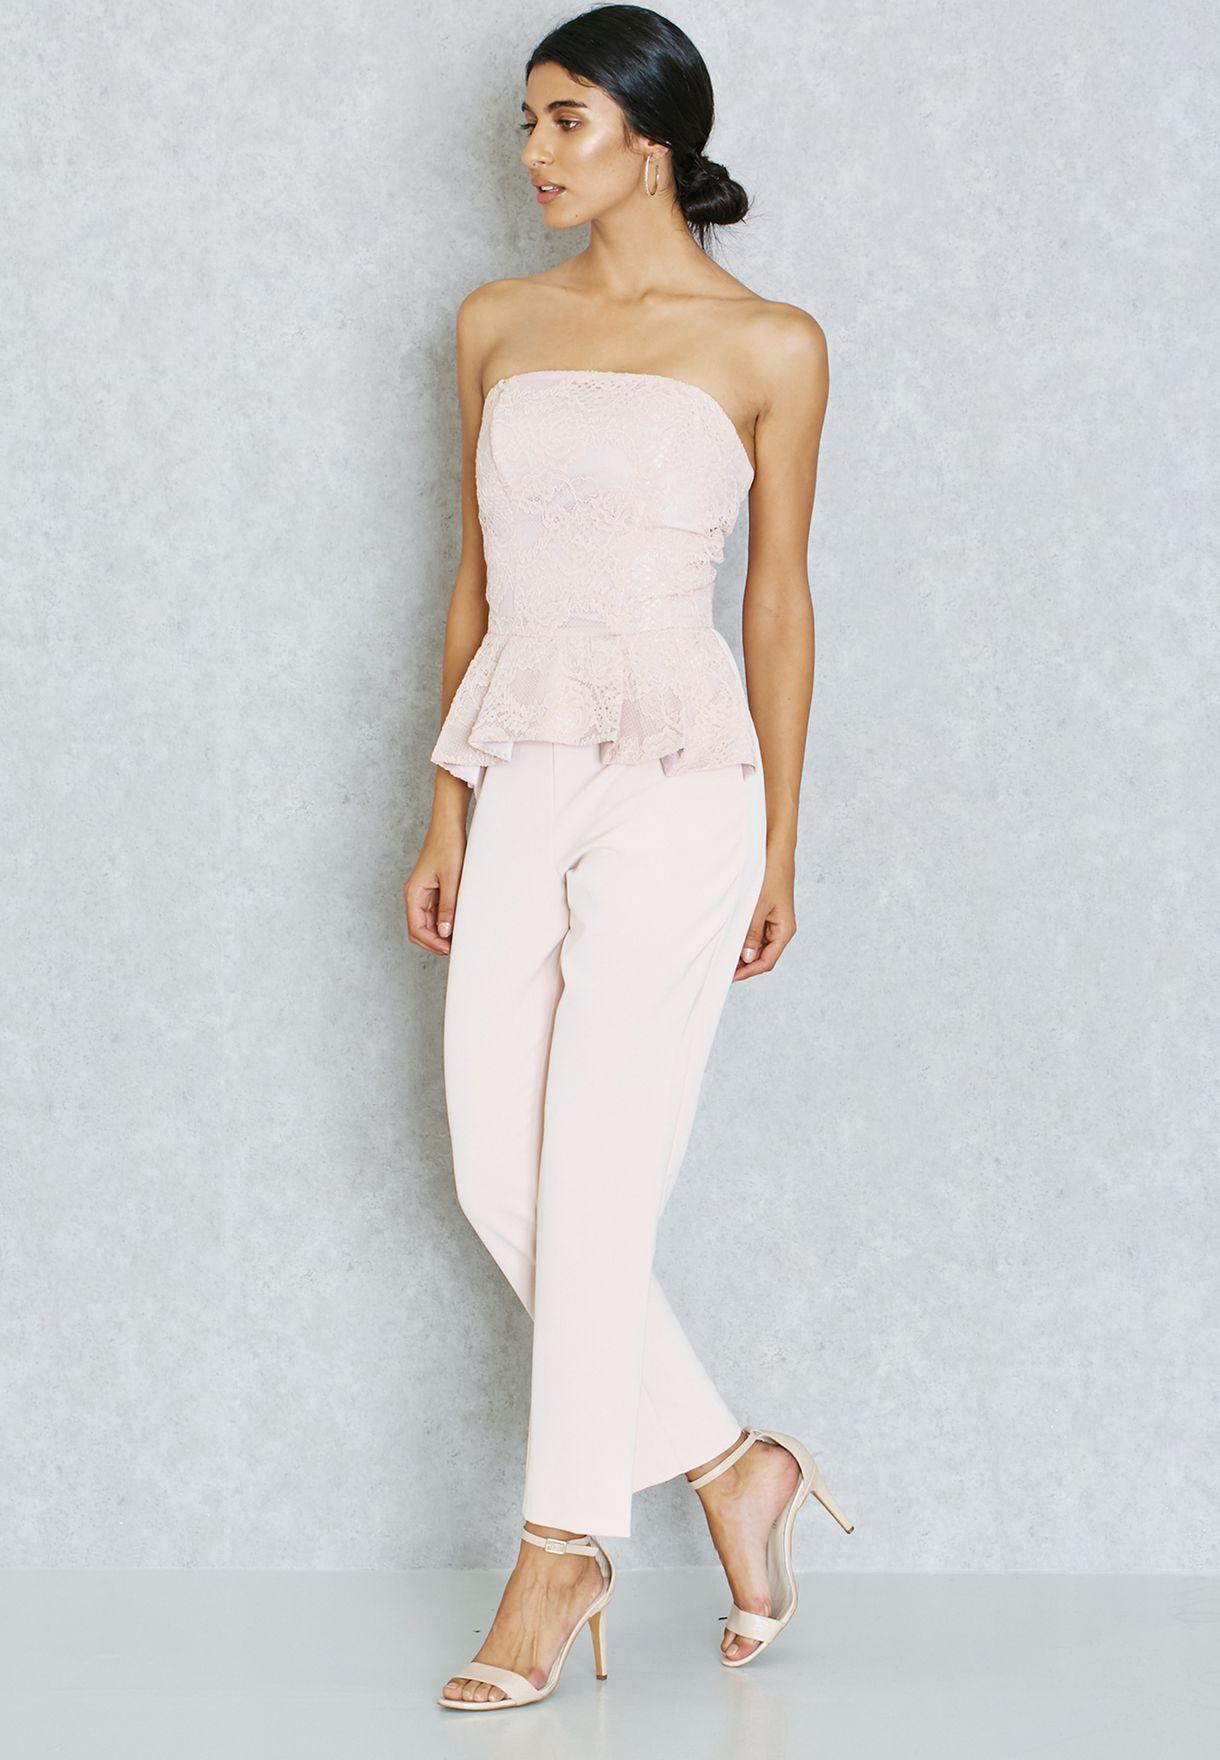 cbff31233d6b Shop Miss Selfridge pink Lace Peplum Jumpsuit 10J02TPNK for Women in ...